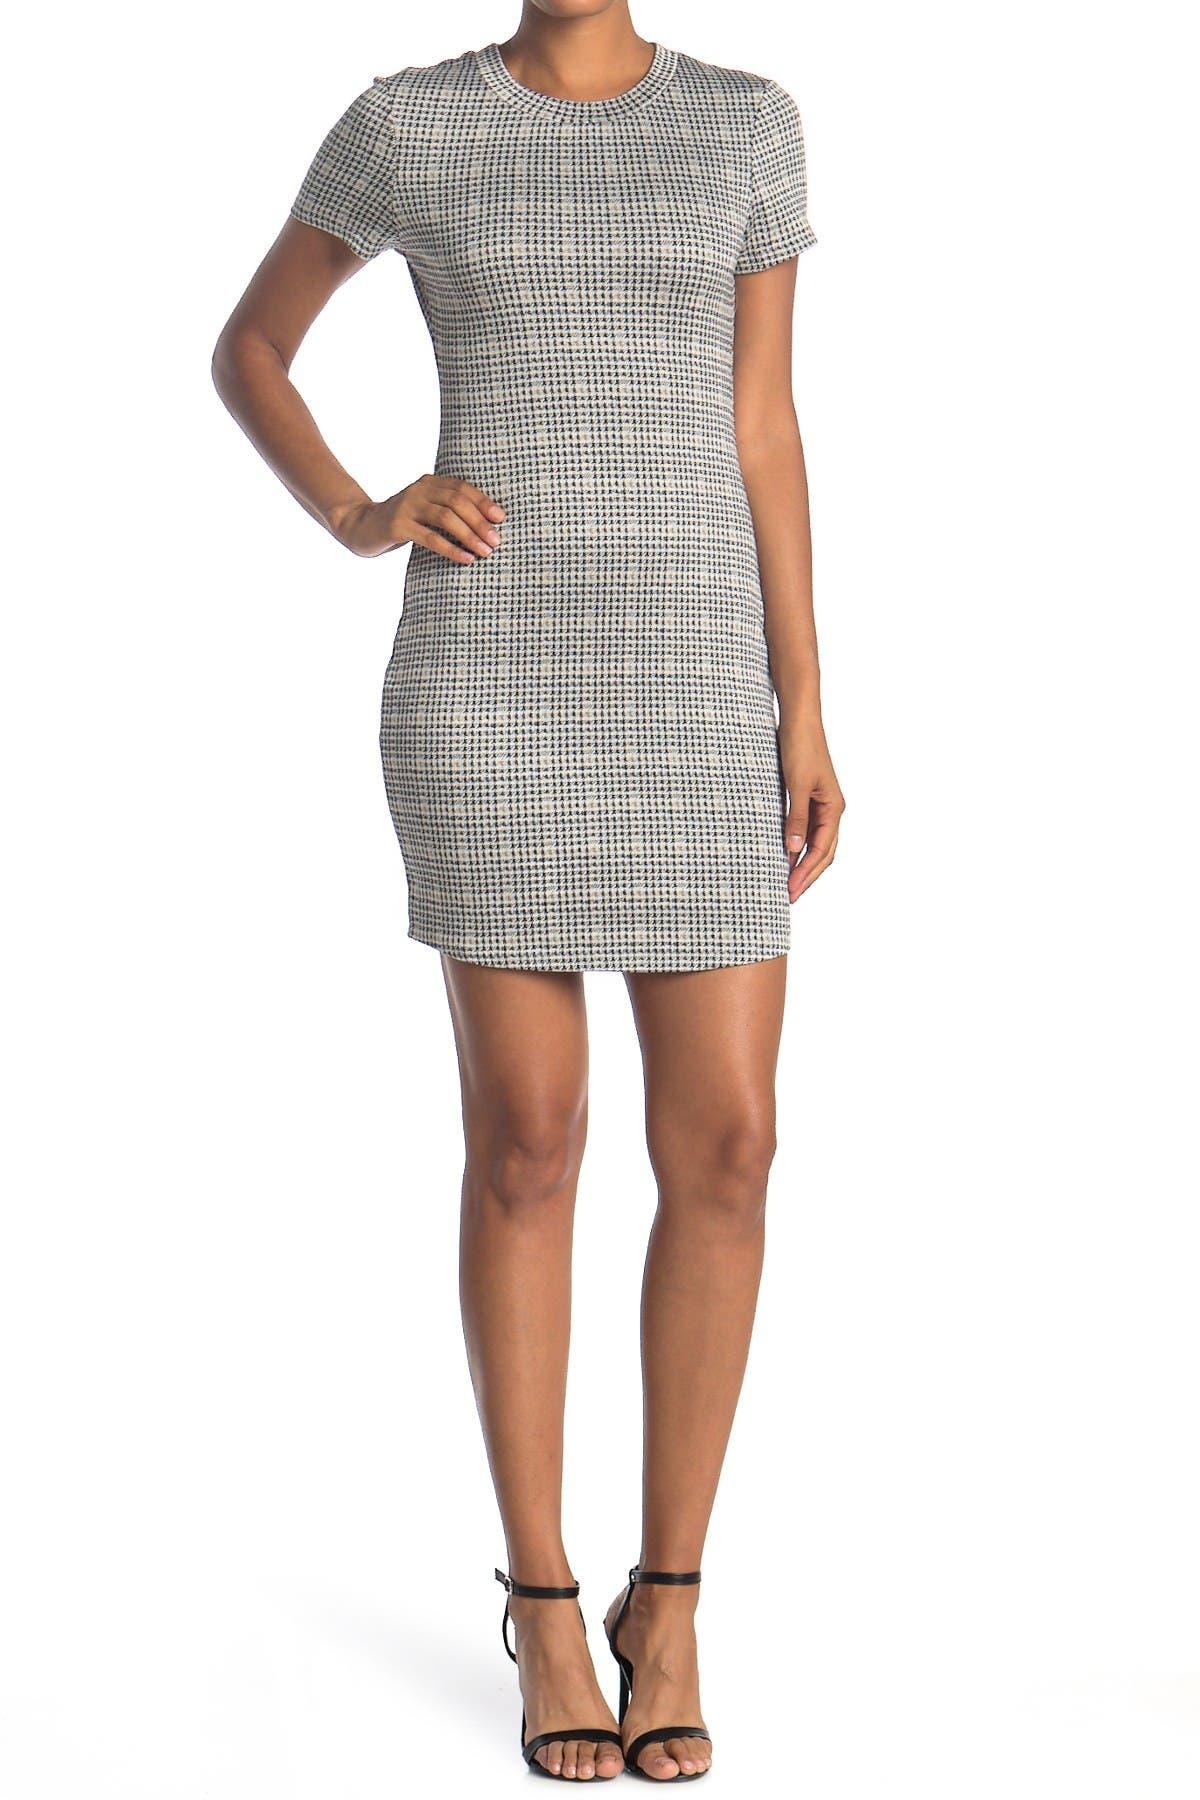 Image of Cloth By Design Plaid T-Shirt Dress